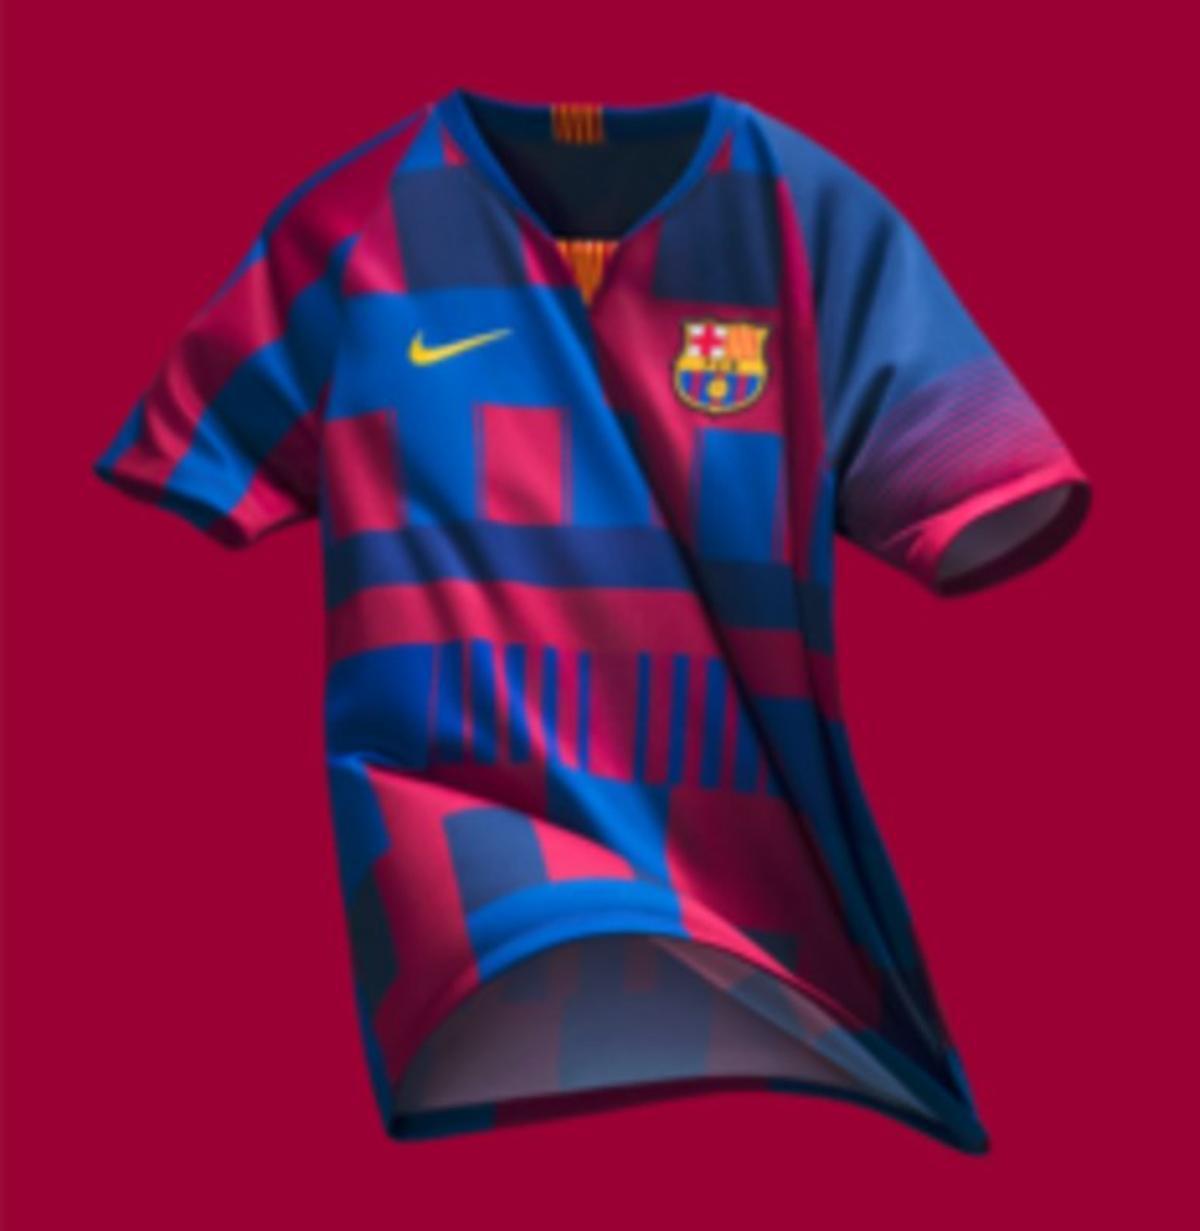 La camiseta del FC Barcelona, de Nike.